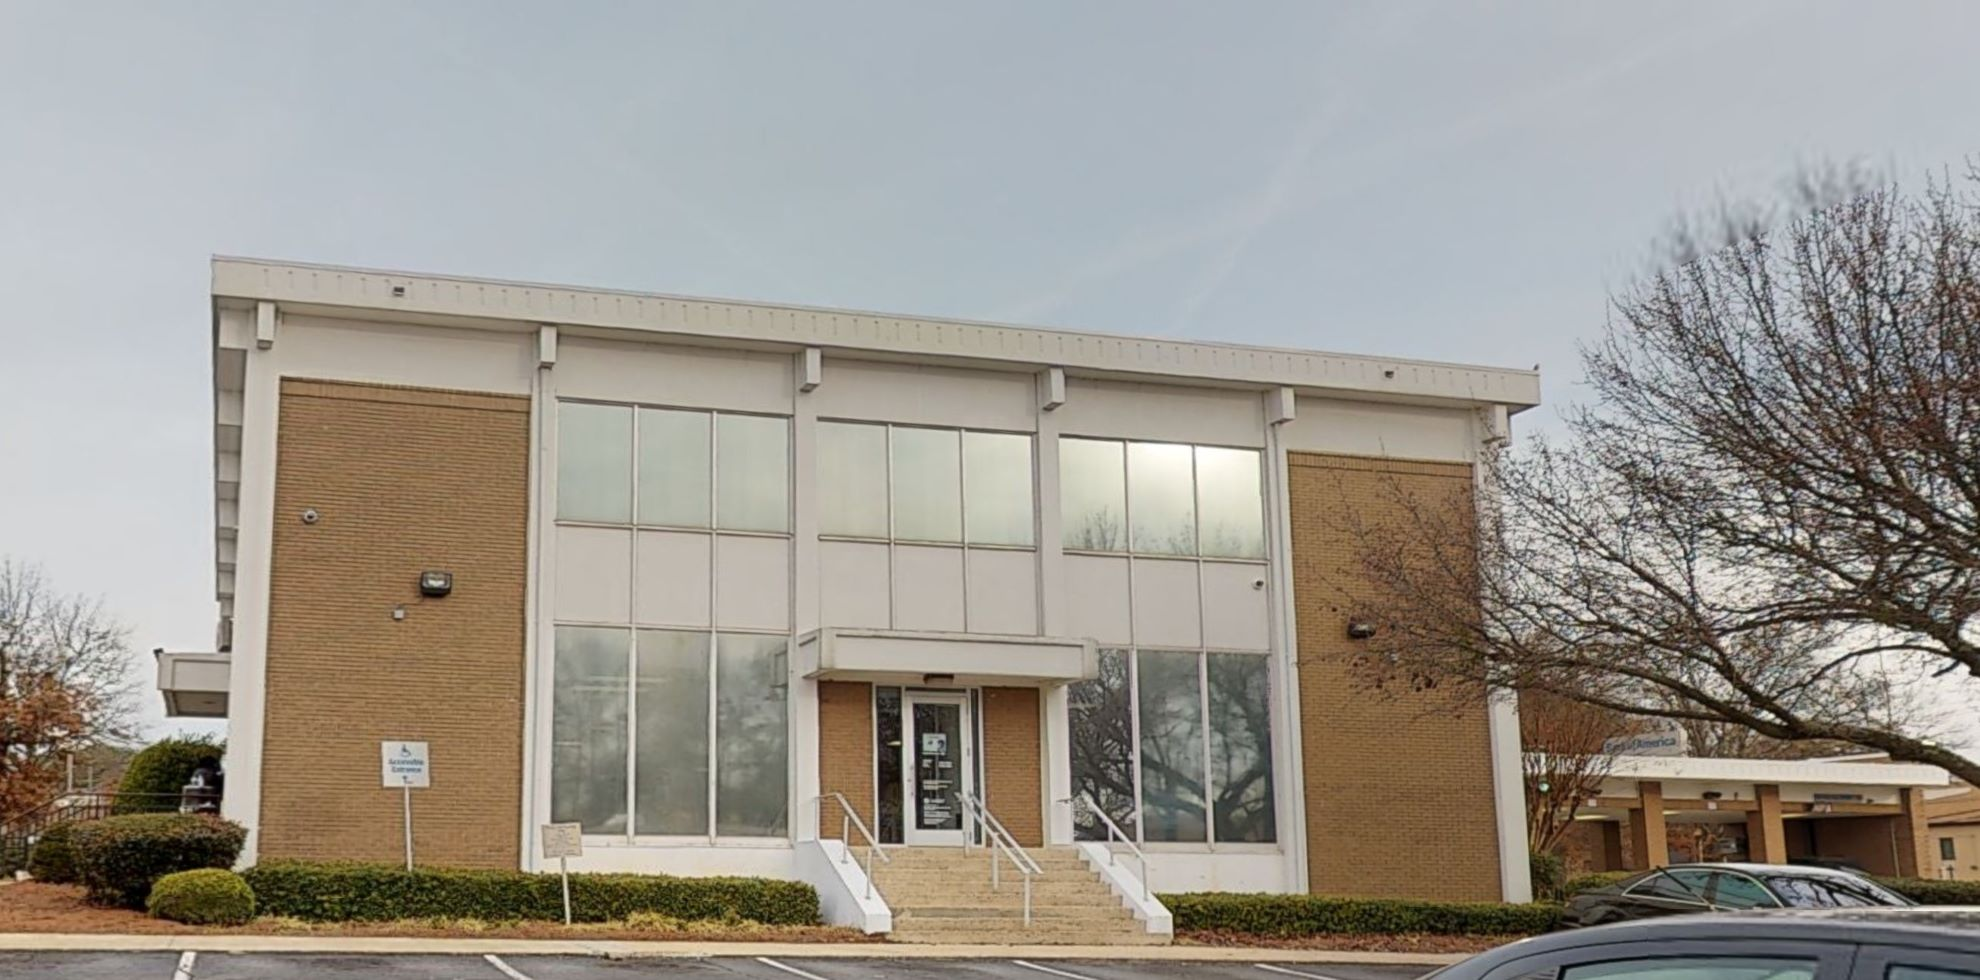 Bank of America financial center with drive-thru ATM | 2333 Main St, Tucker, GA 30084